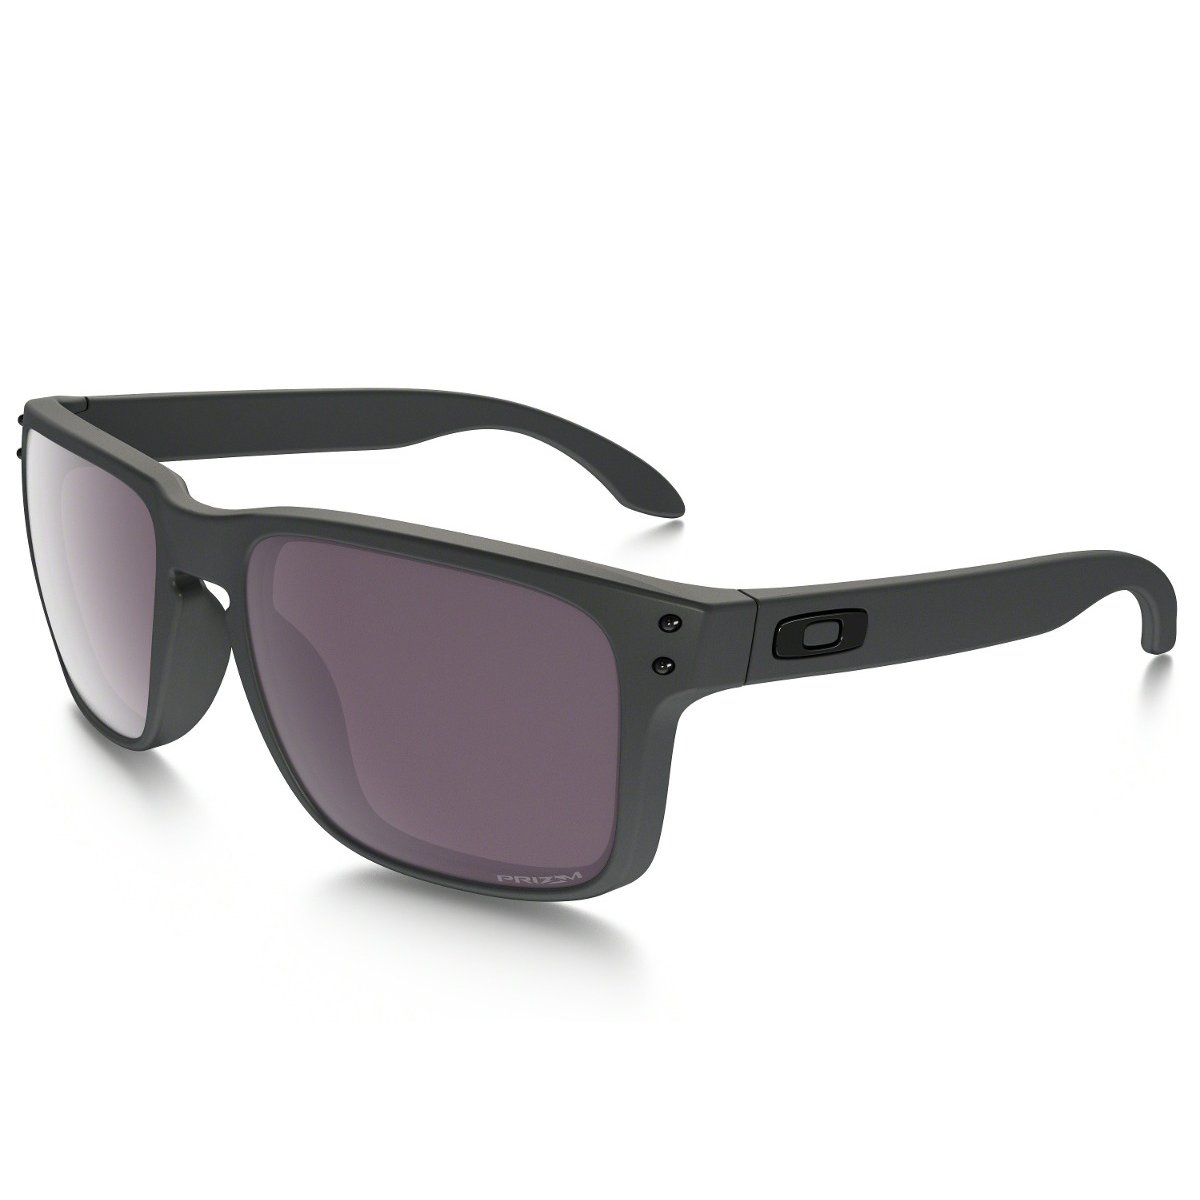 a834bb702f123 Óculos Oakley Holbrook Matte Steel Prizm Daily Pol